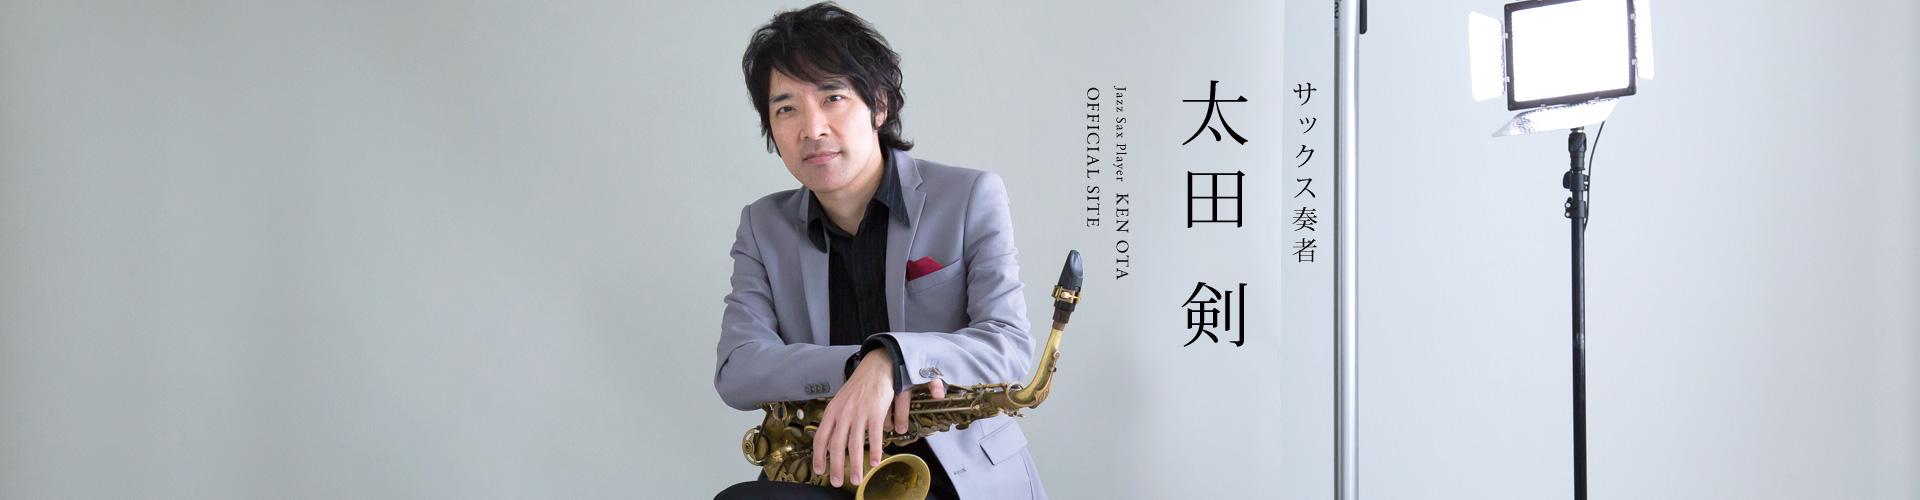 PROFILE | サックス奏者 太田剣 OFFICIAL SITE